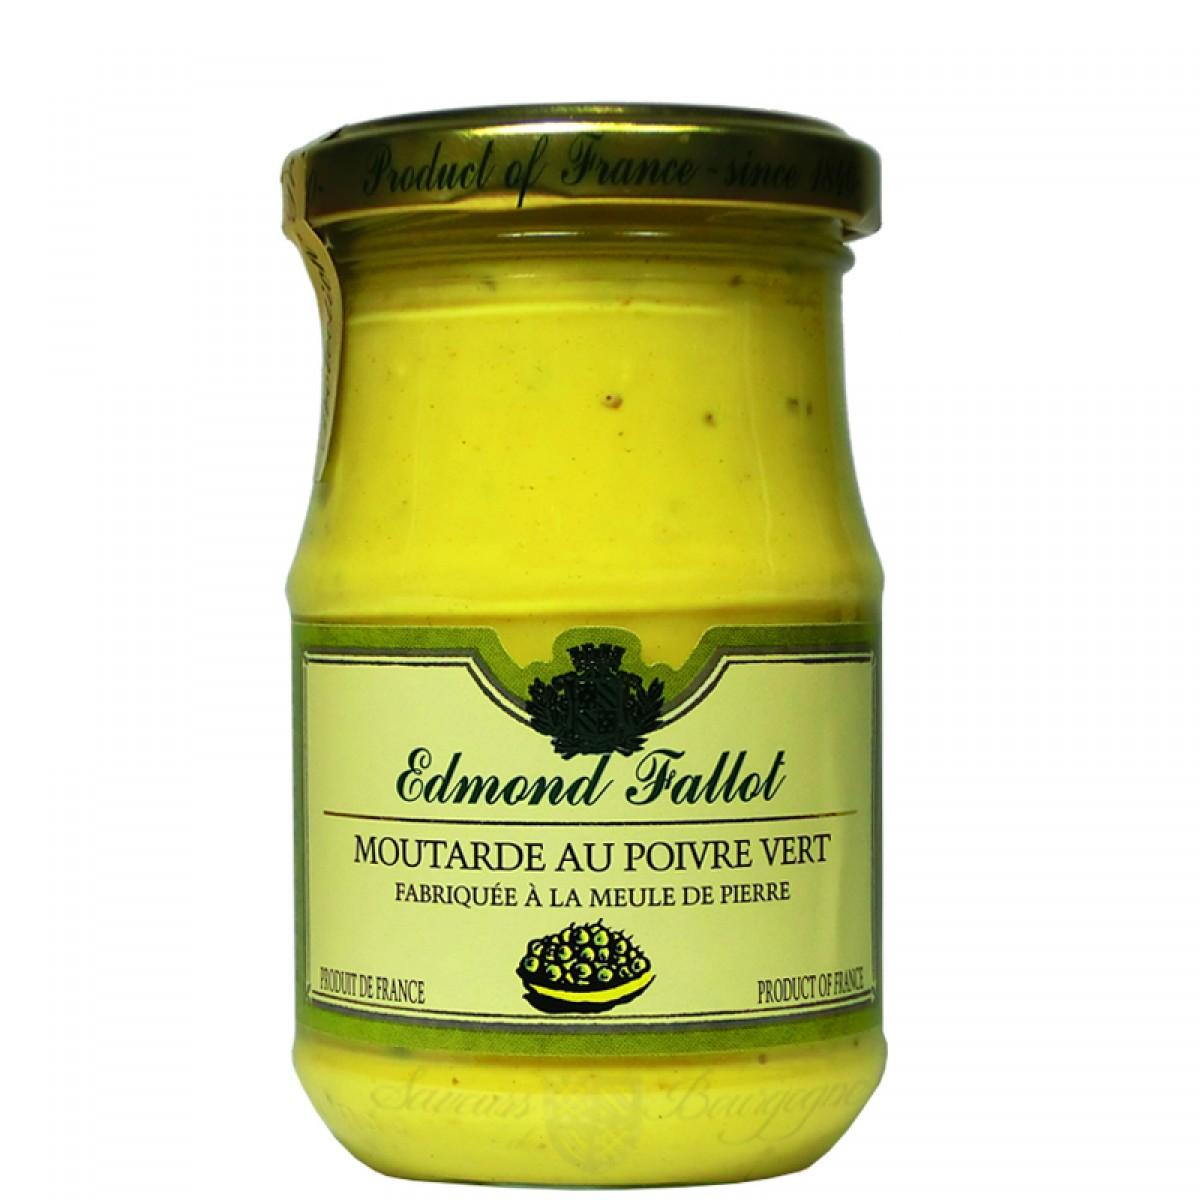 Moutarde au poivre vert 210g fallot saveurs de bourgogne vente de produit - Moutarde fallot vente ...